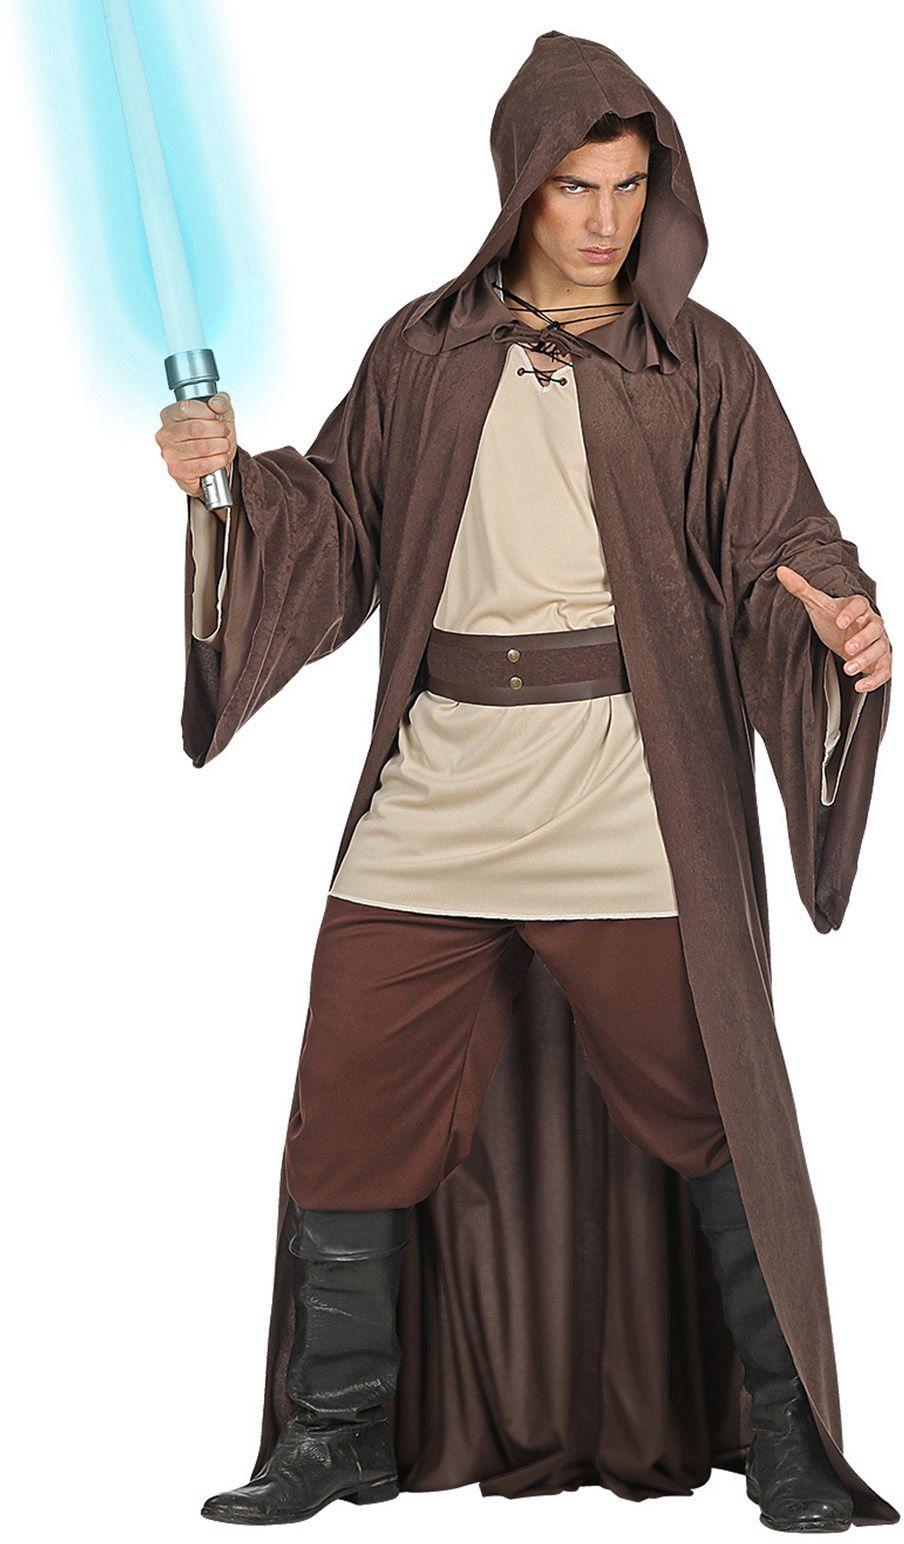 Star Wars Jedi outfit